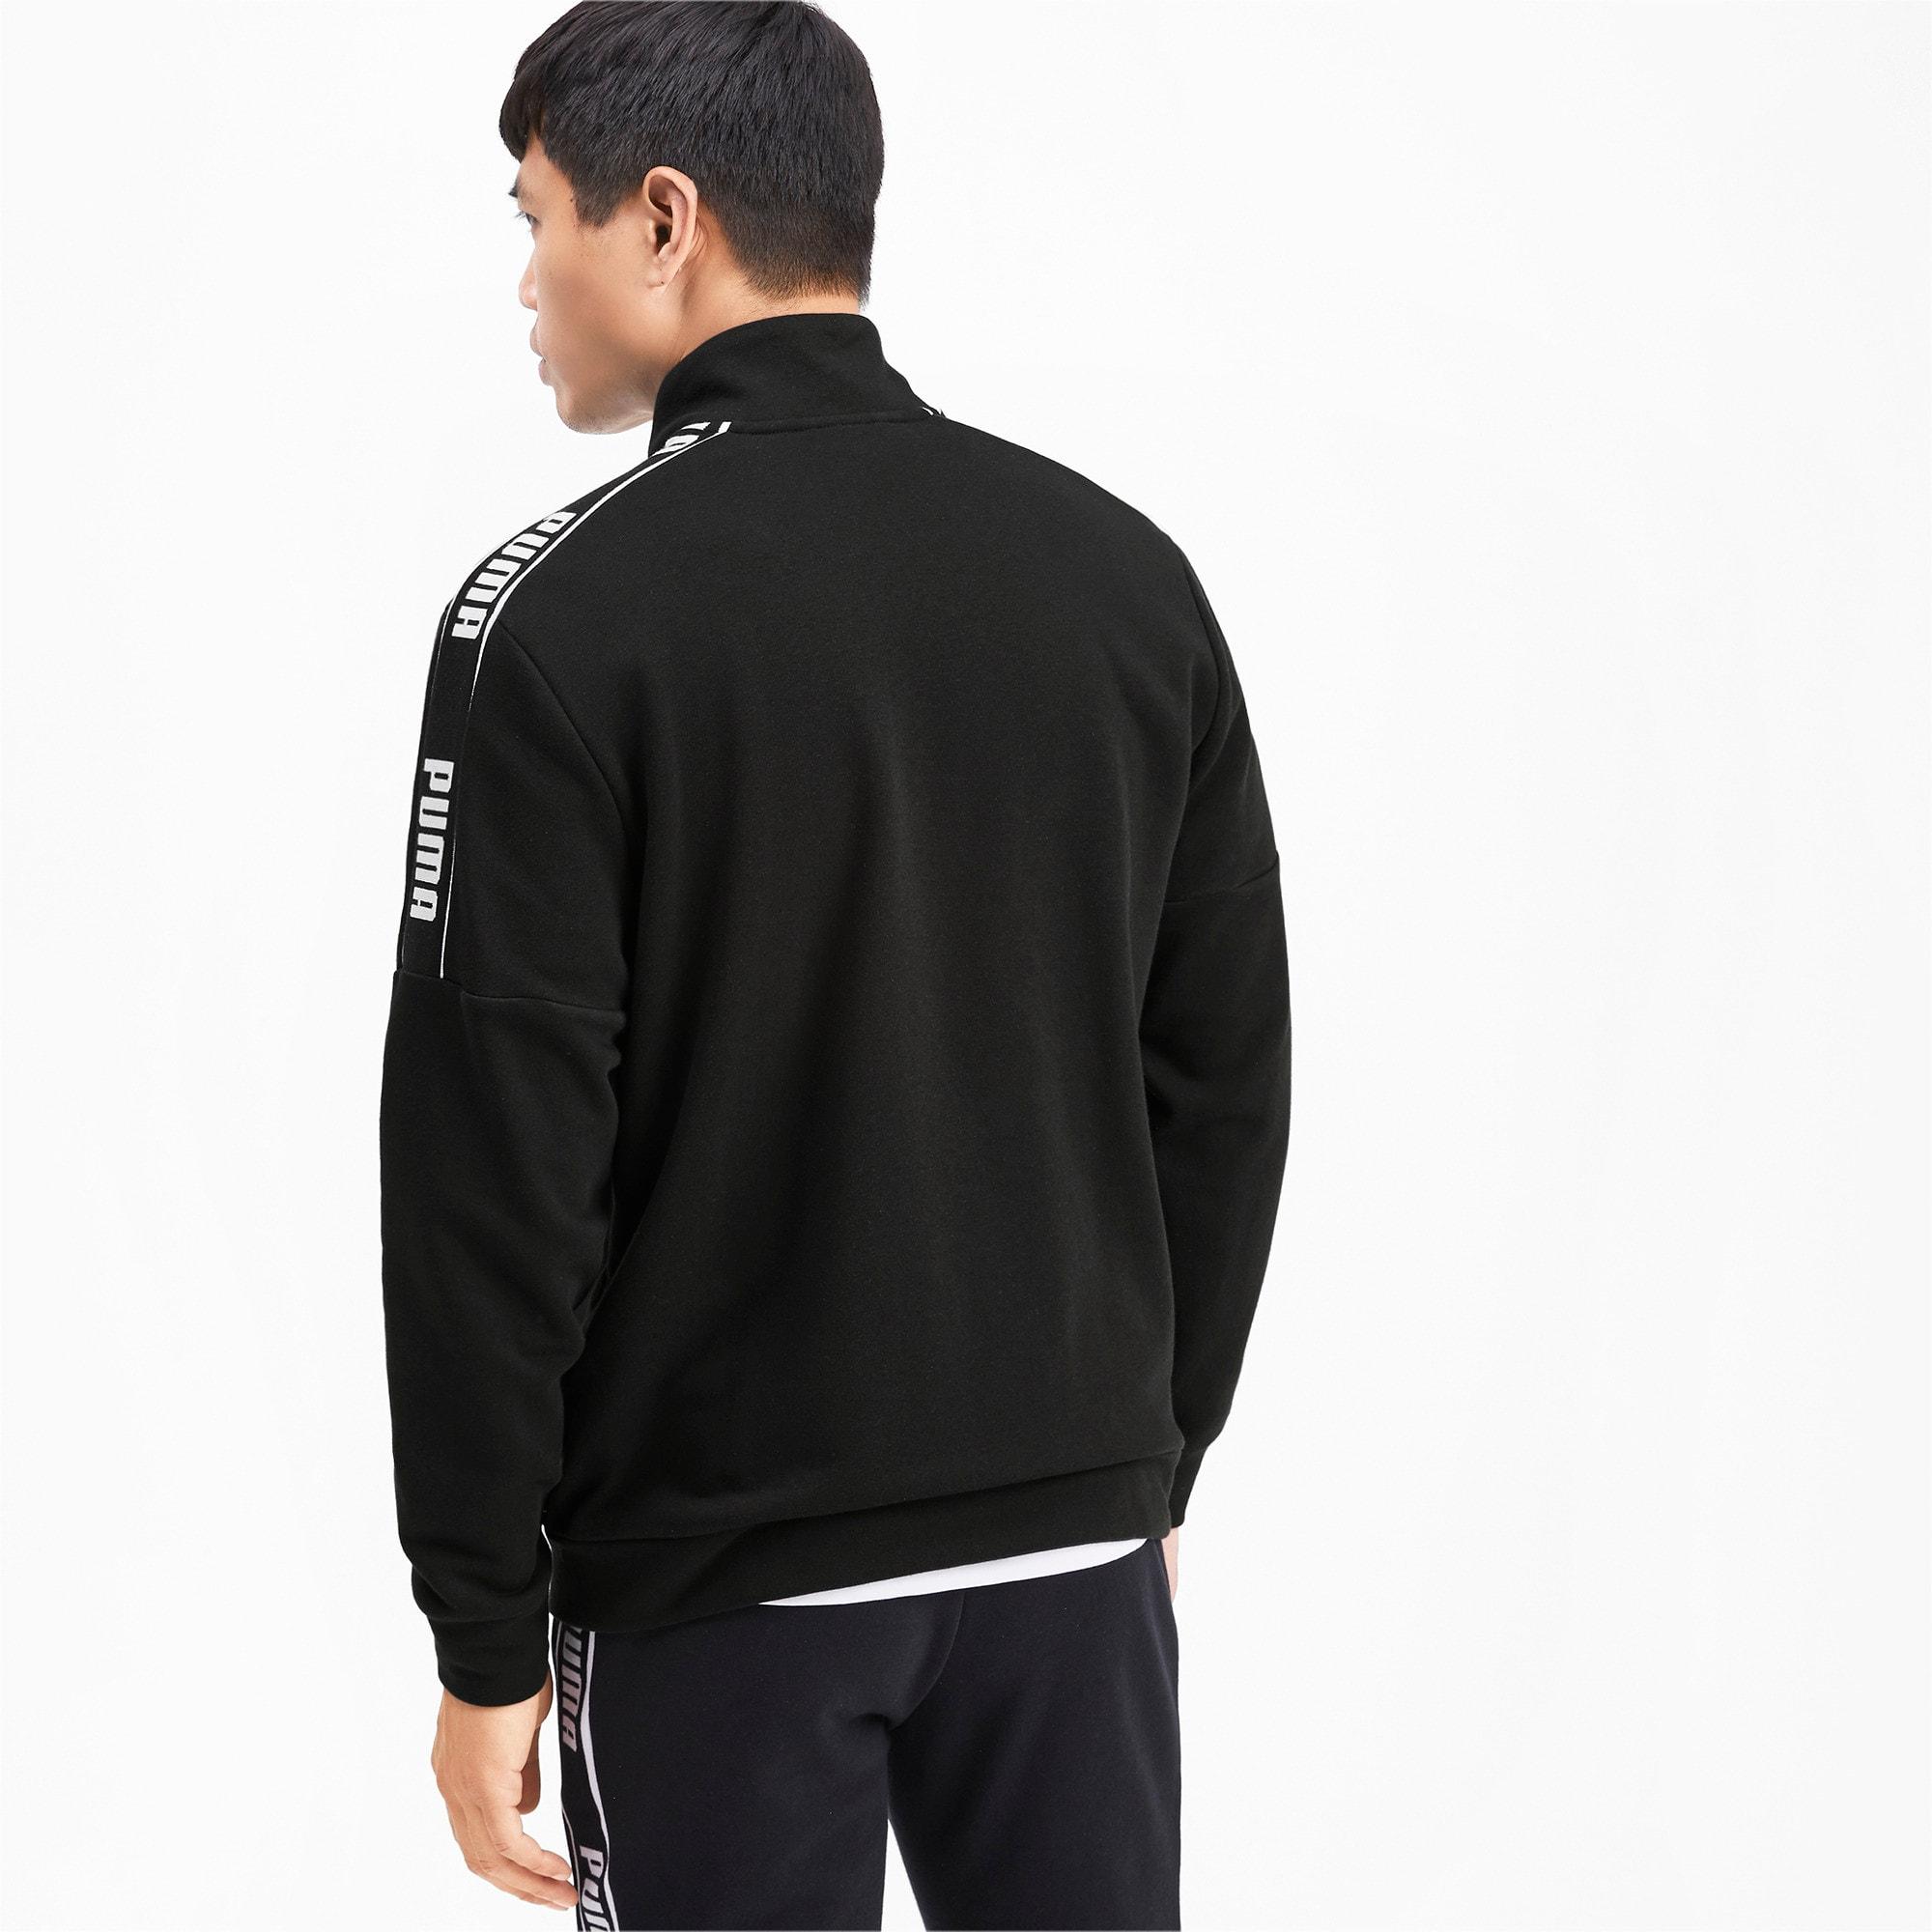 Thumbnail 3 of Amplified Men's Track Jacket, Puma Black, medium